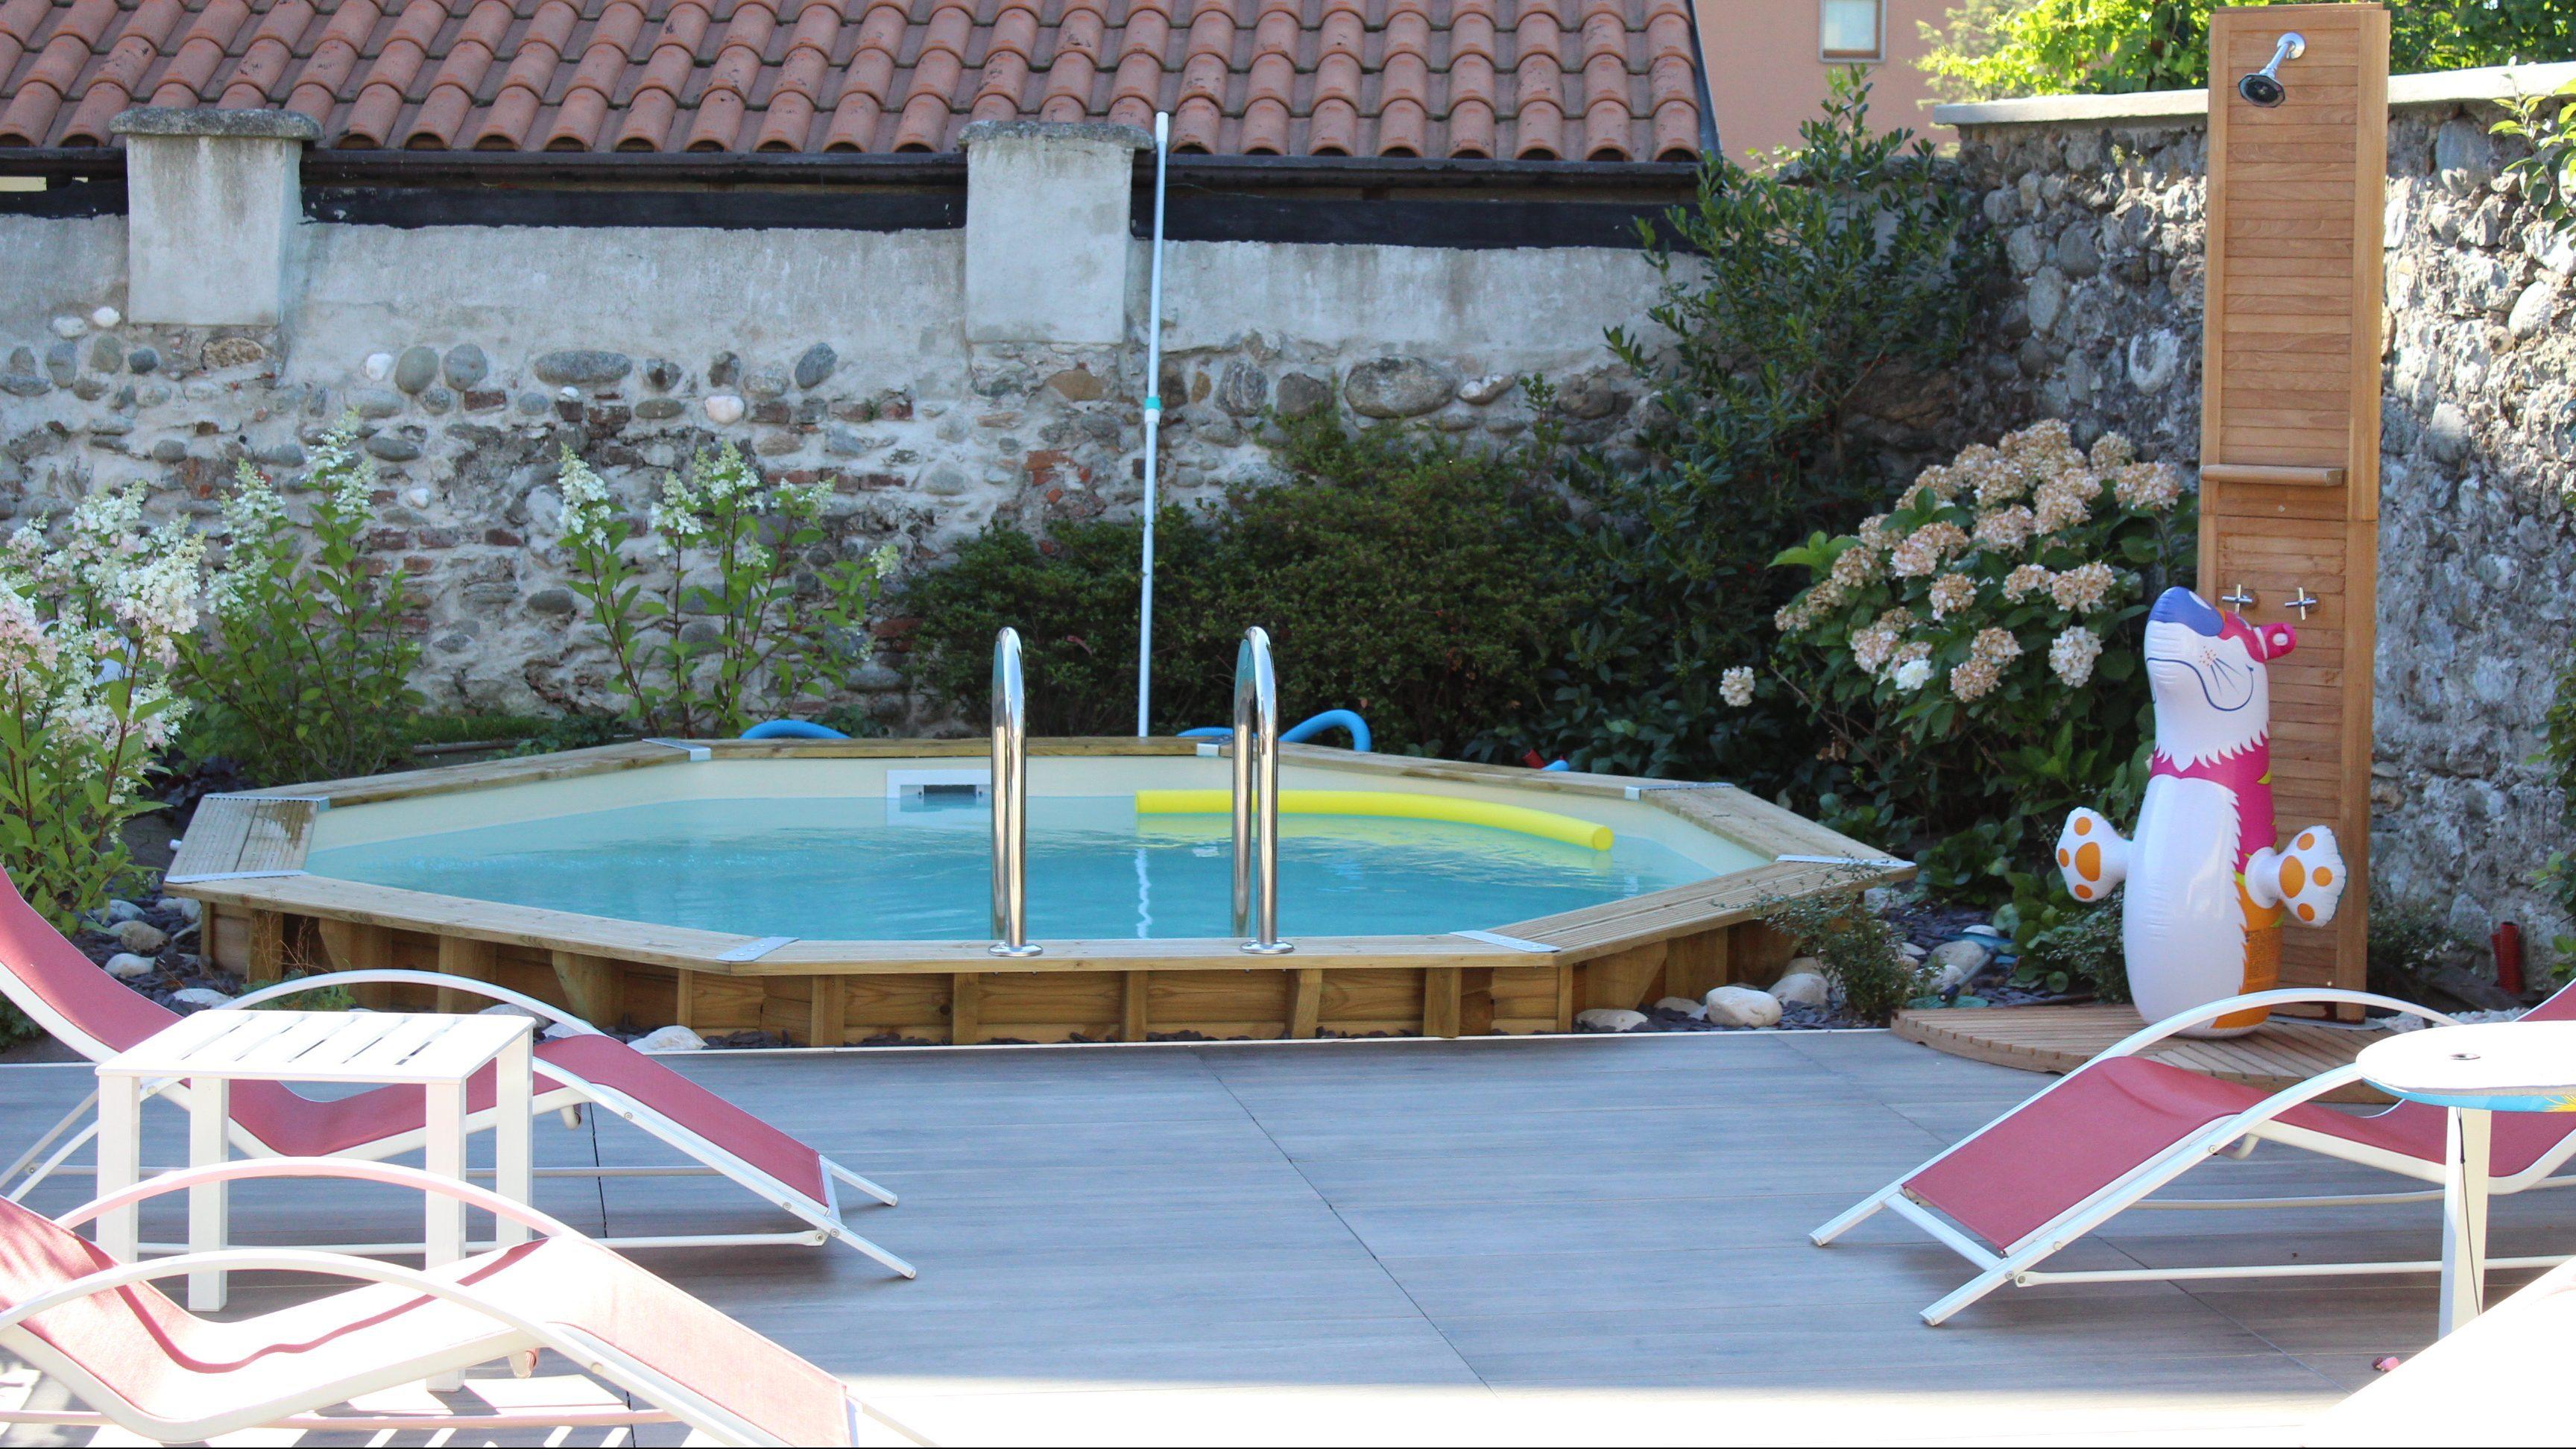 Giardino Romagnano sesia verdedeisgn piscina legno